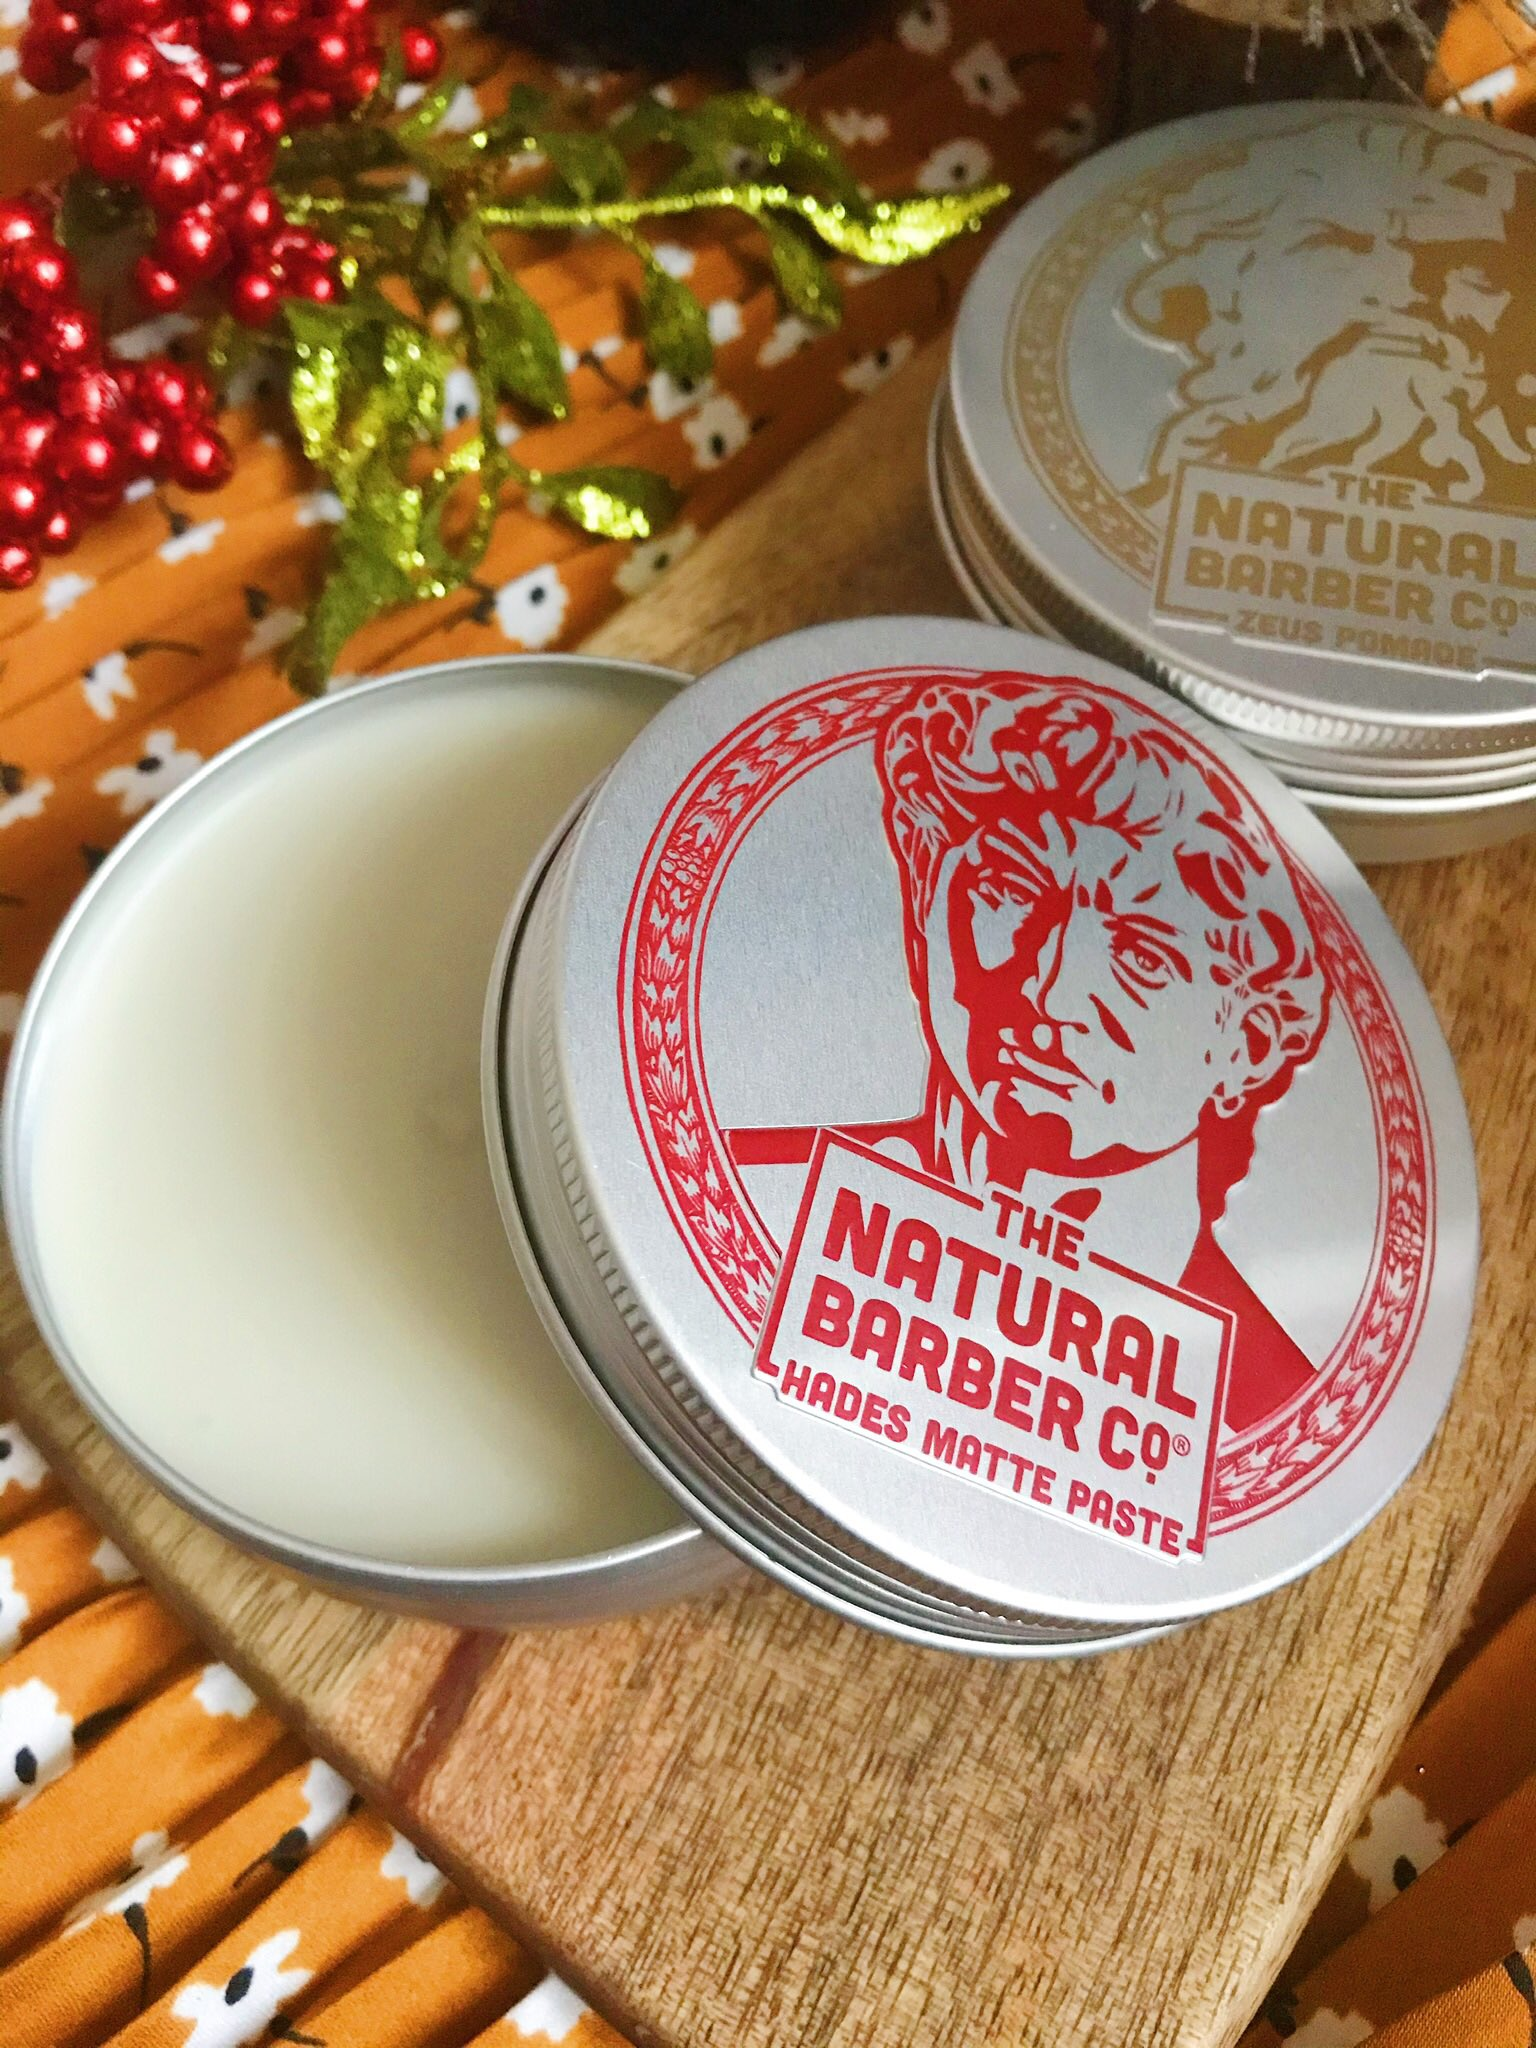 The Natural Barber Co hair wax